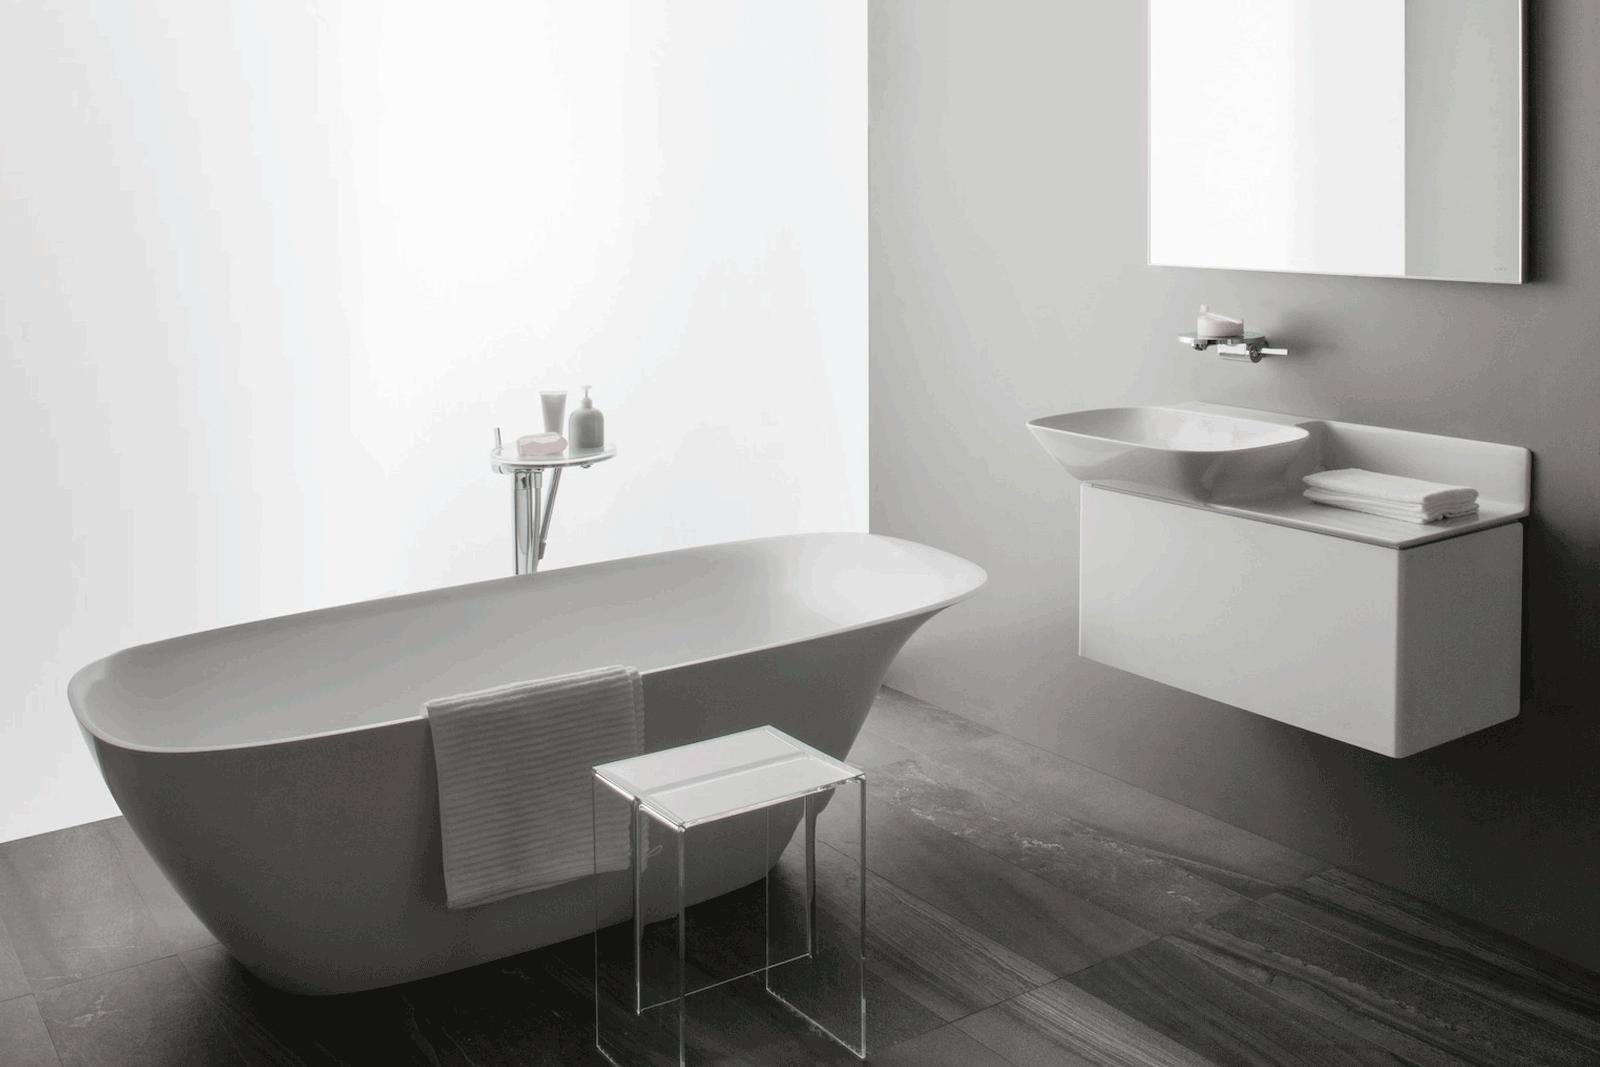 laufen-ino-bathroom